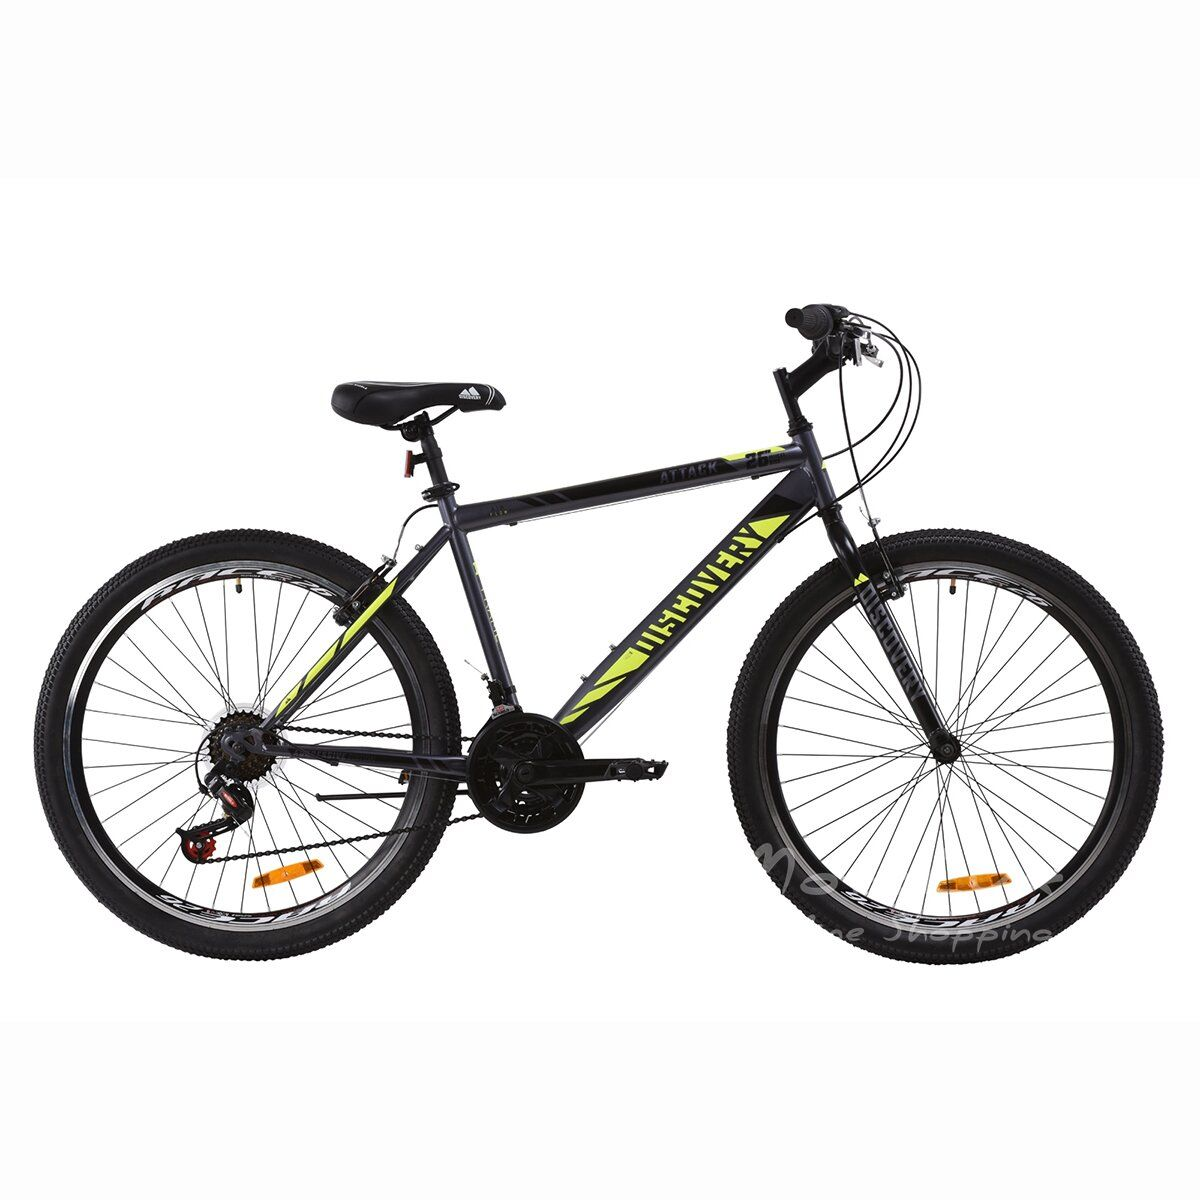 City bike Discovery Attack Vbr, wheels 26, frame 18, 2019 ...